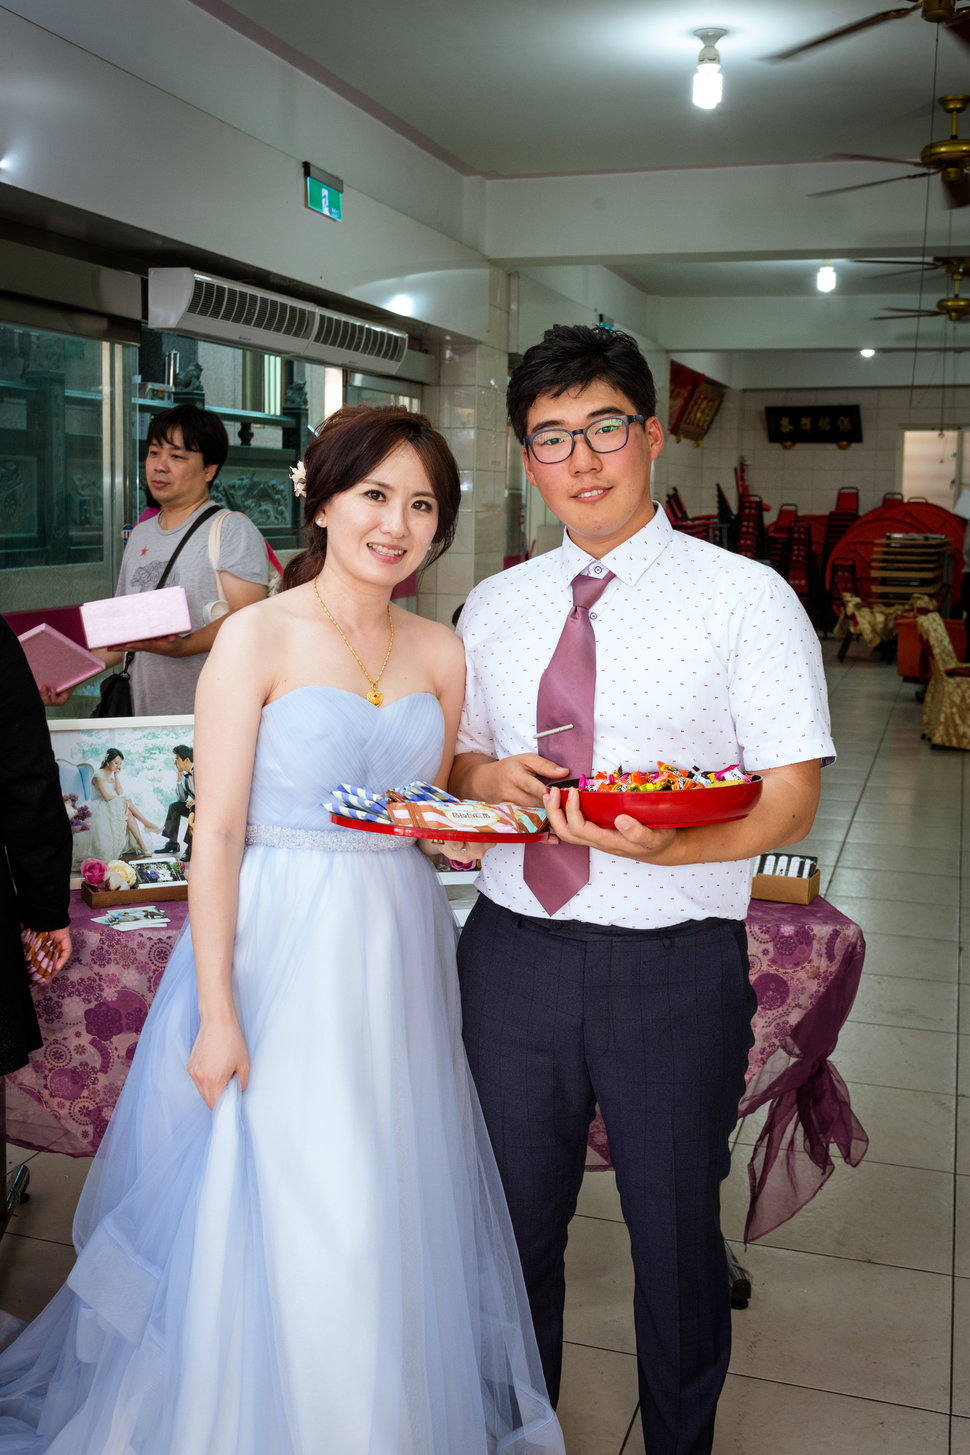 520A0438 - MS攝影美學 - 結婚吧